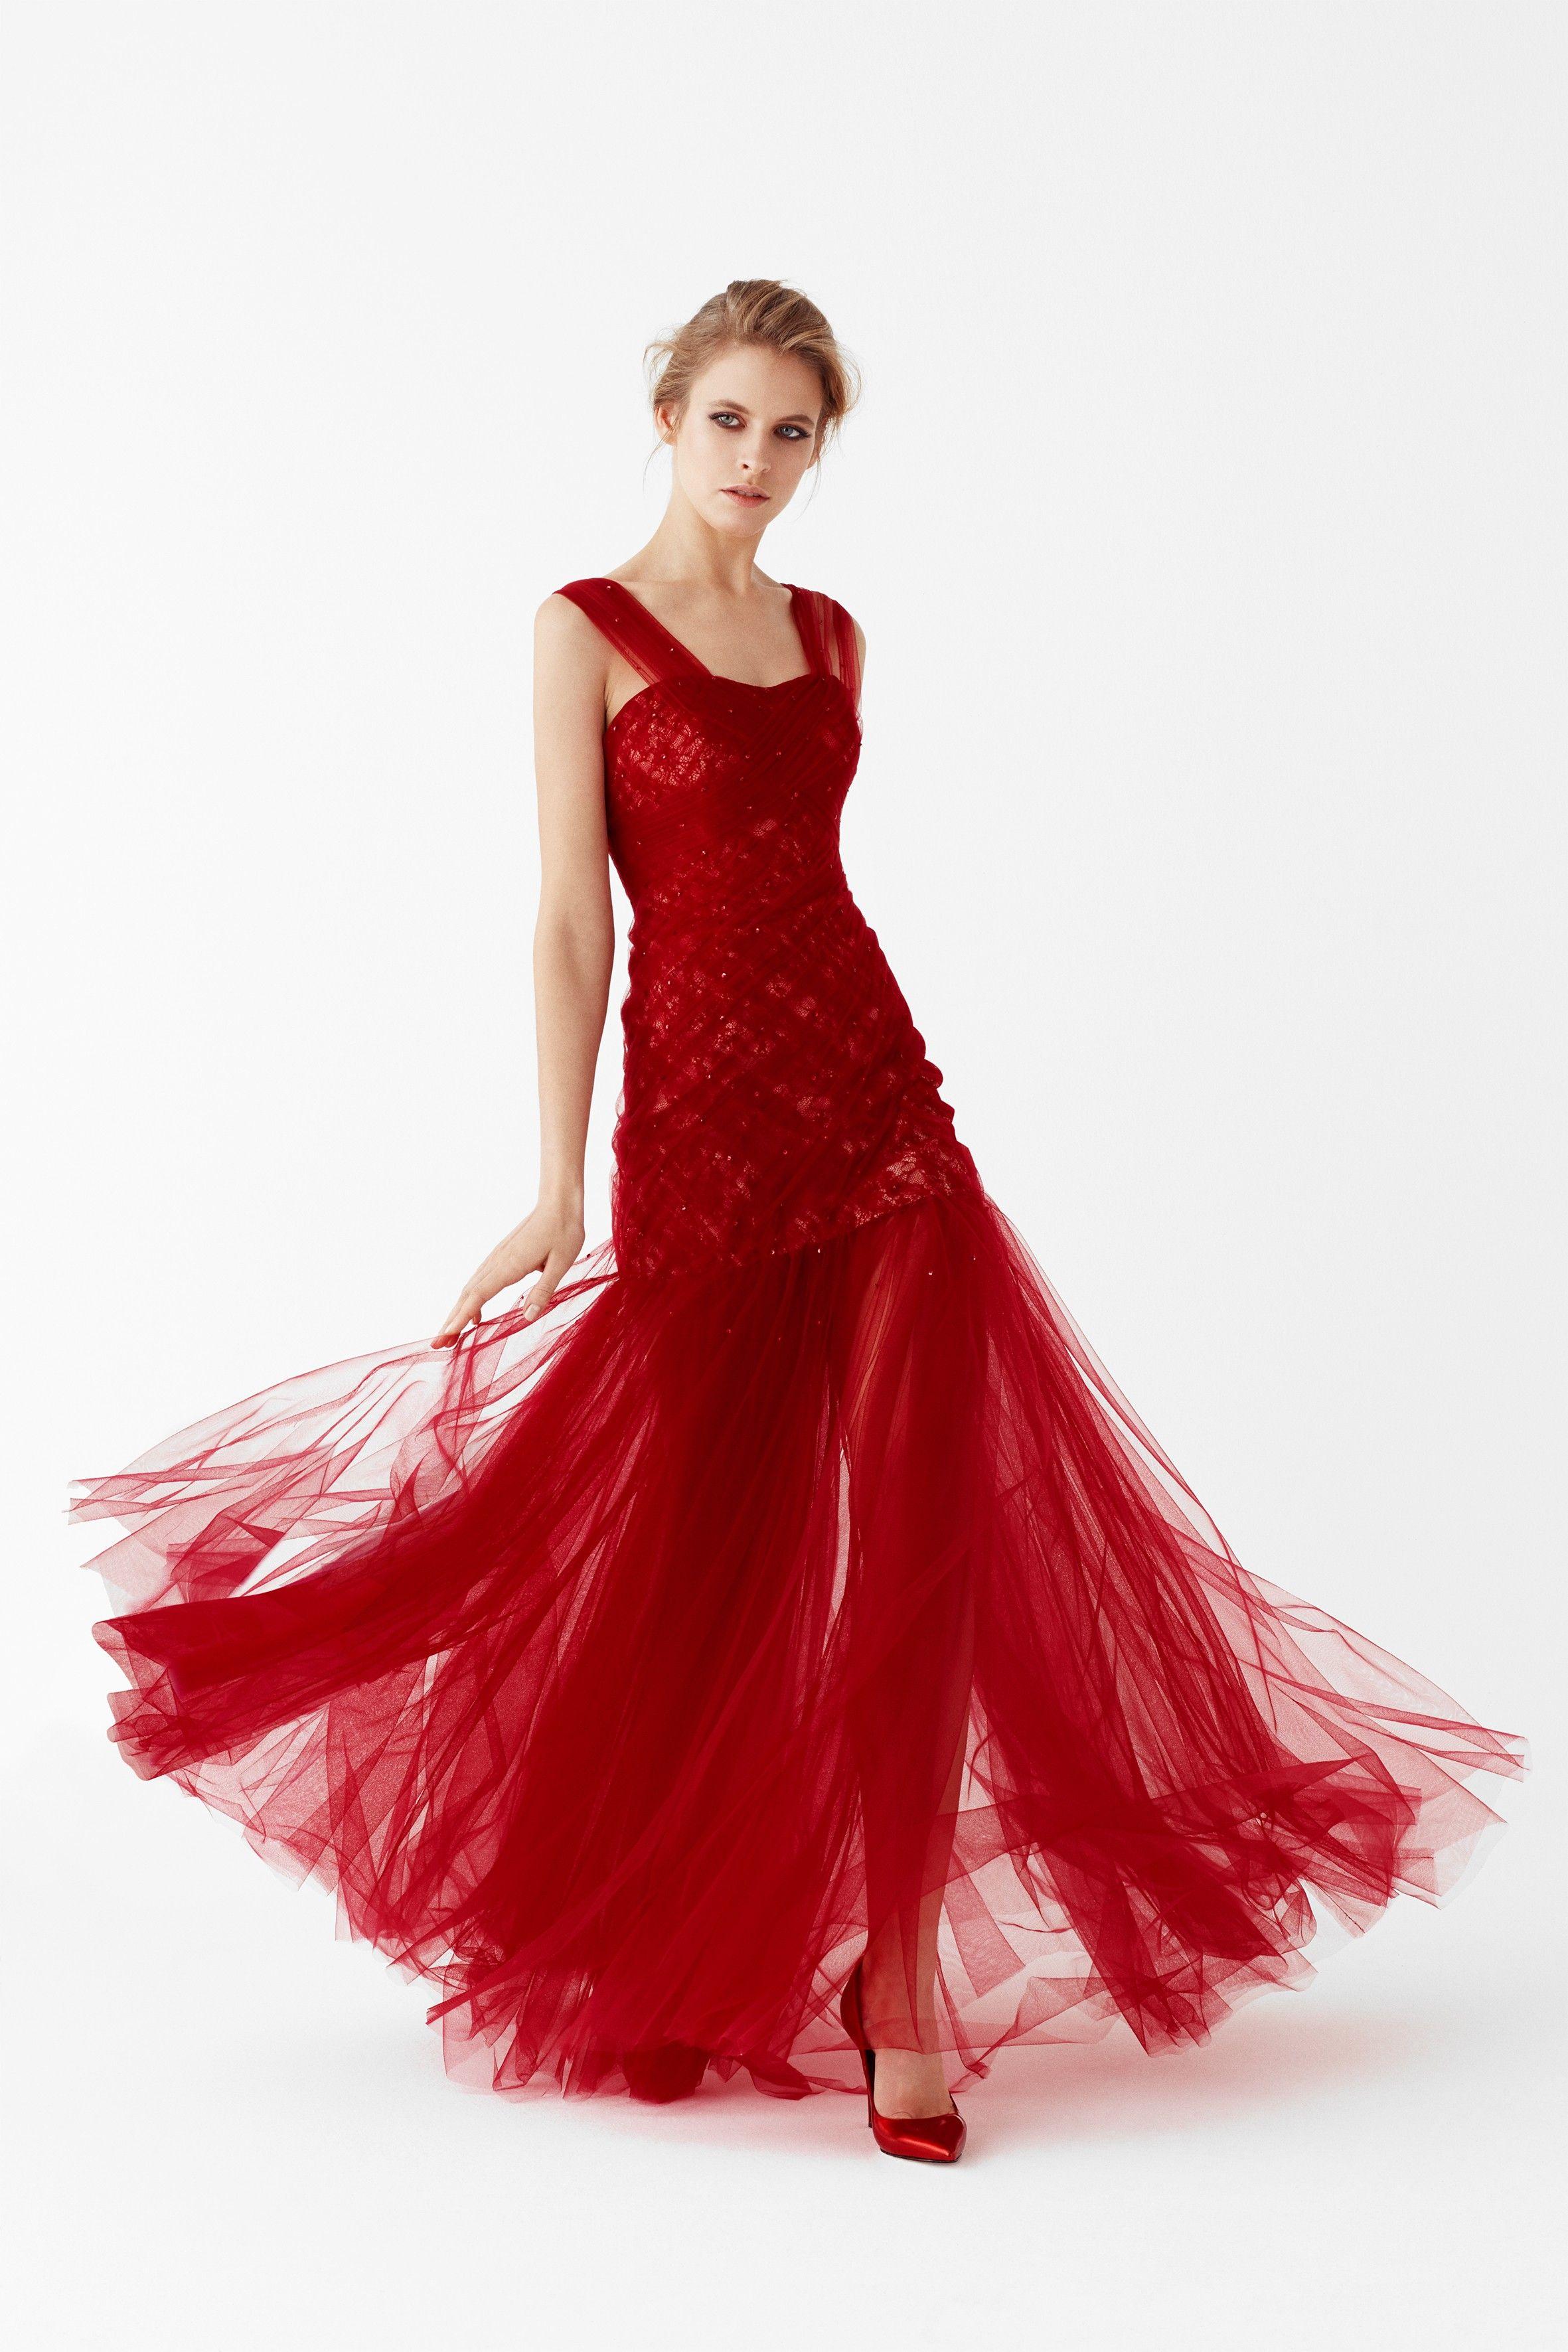 Kirmizi Nisan Elbisesi Modelleri The Dress Parti Elbisesi Moda Stilleri